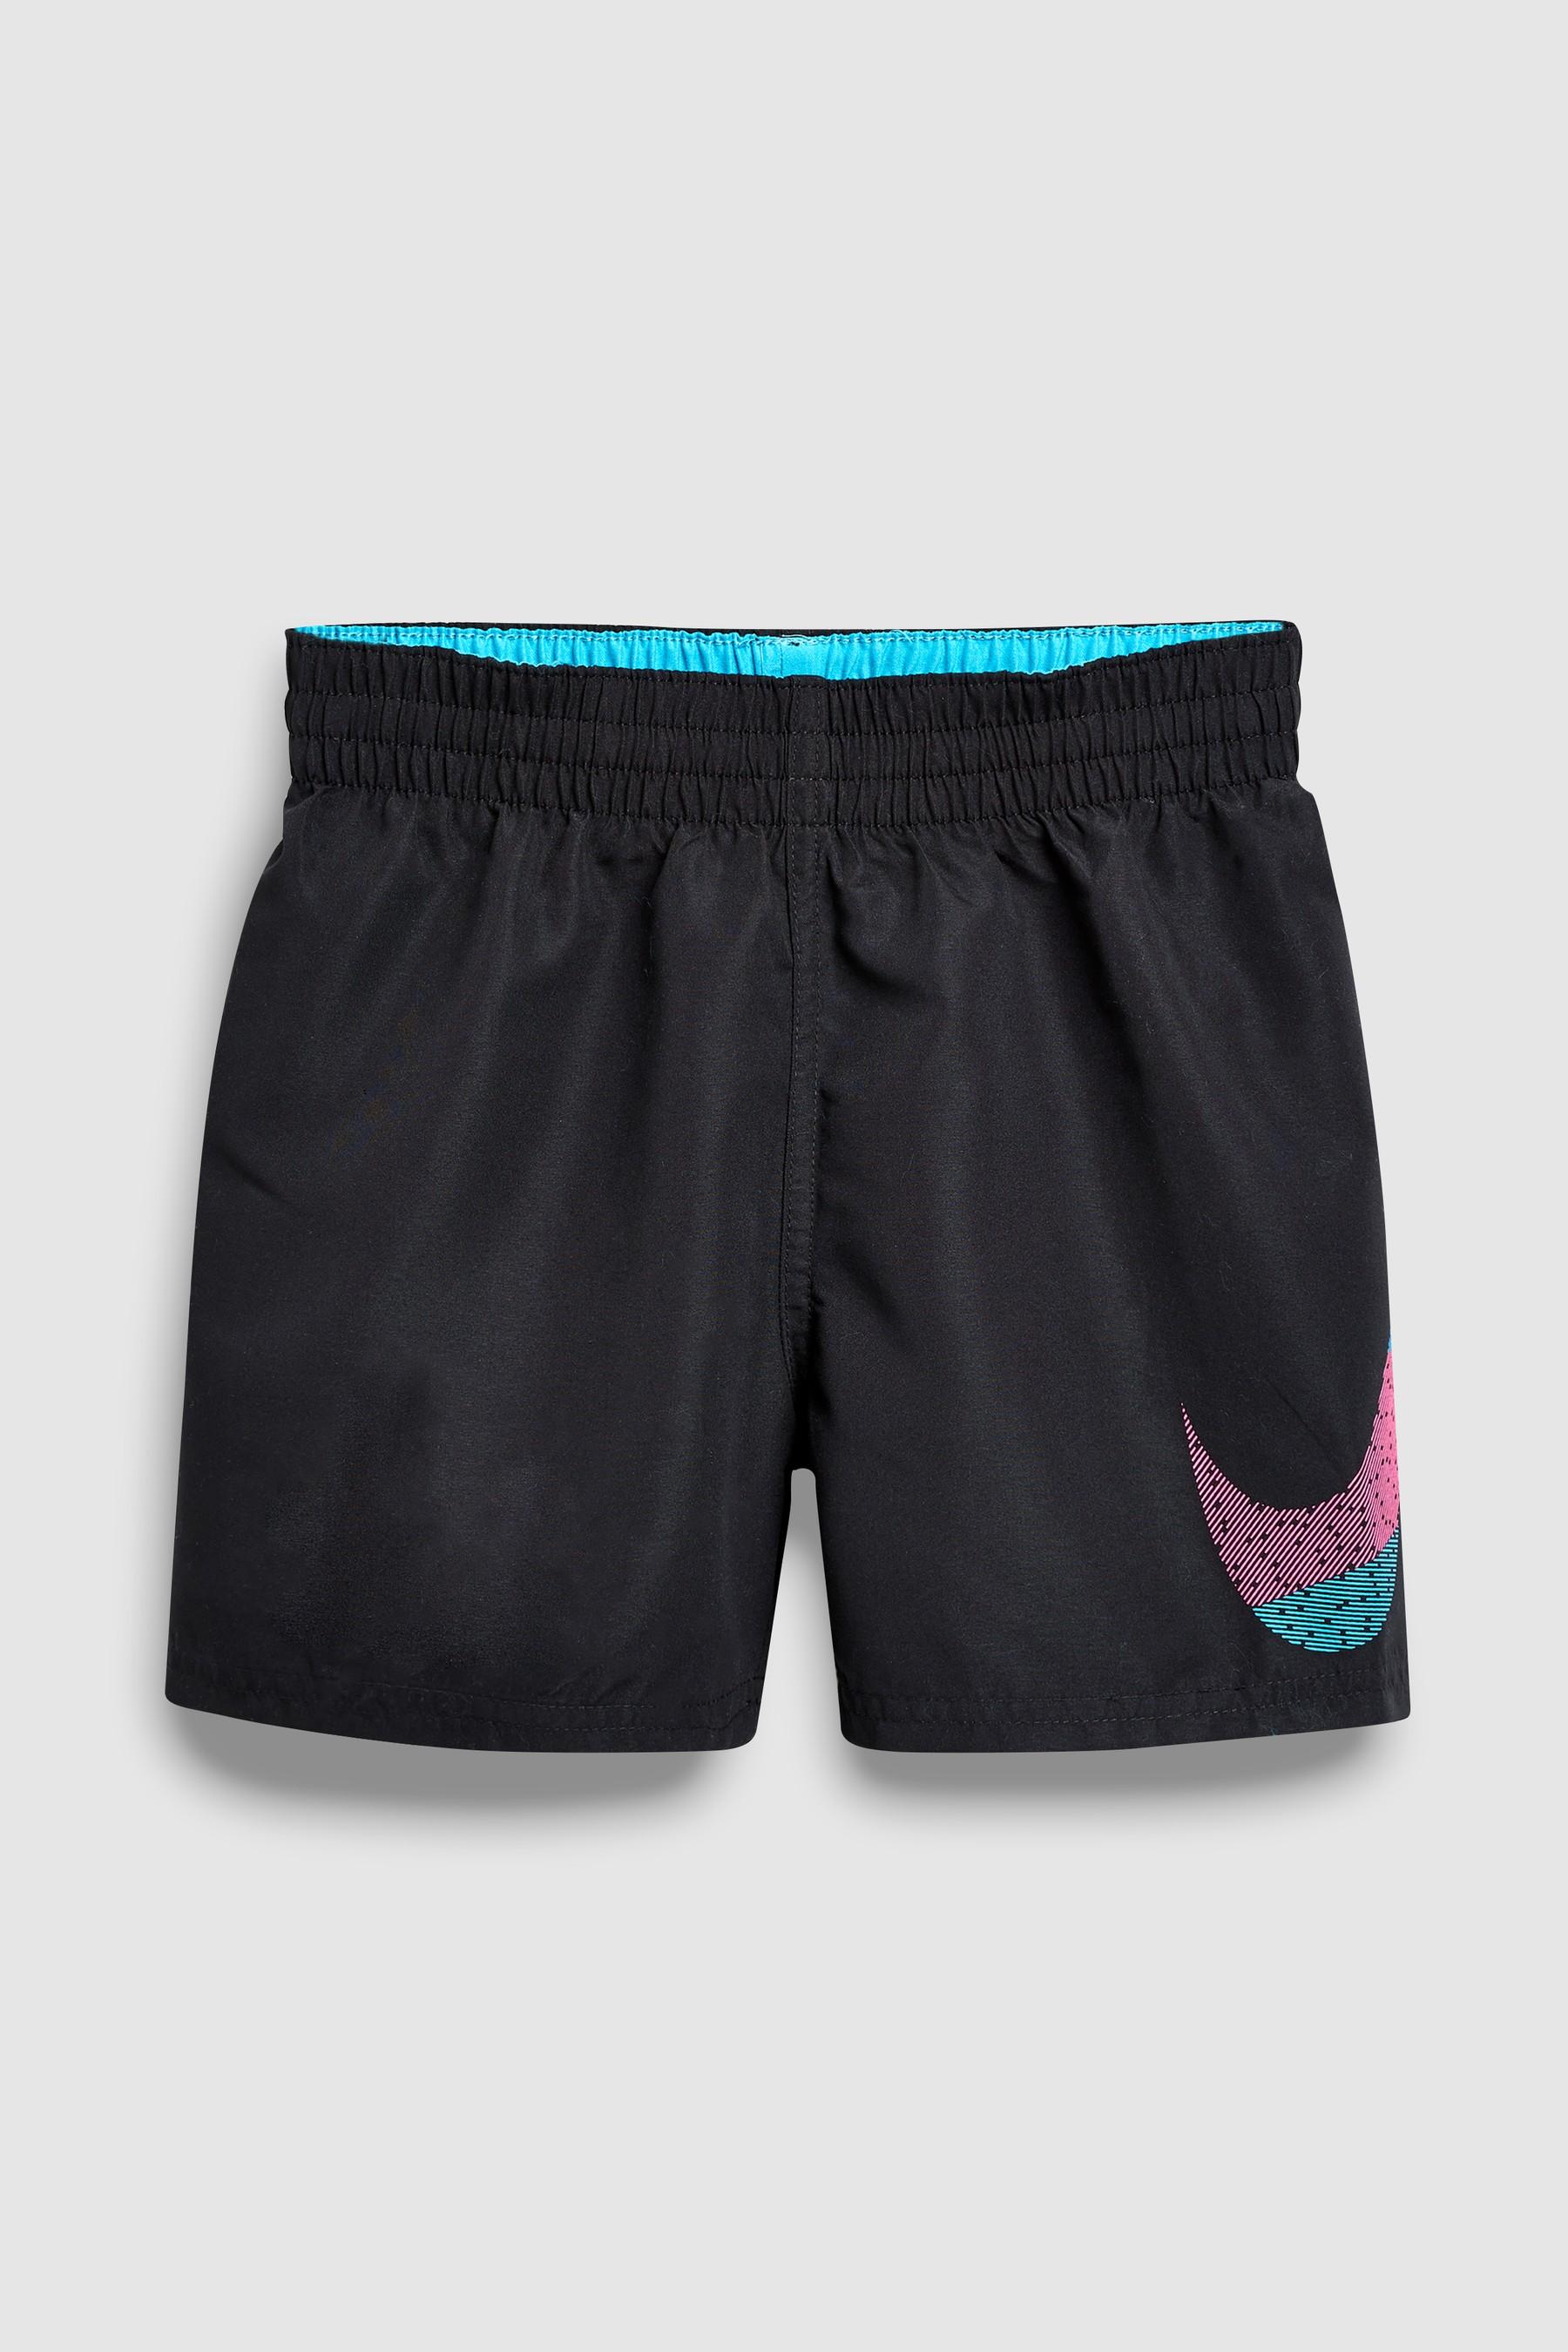 72616118154 Boys Nike Swim Black Mash Up Breaker 4